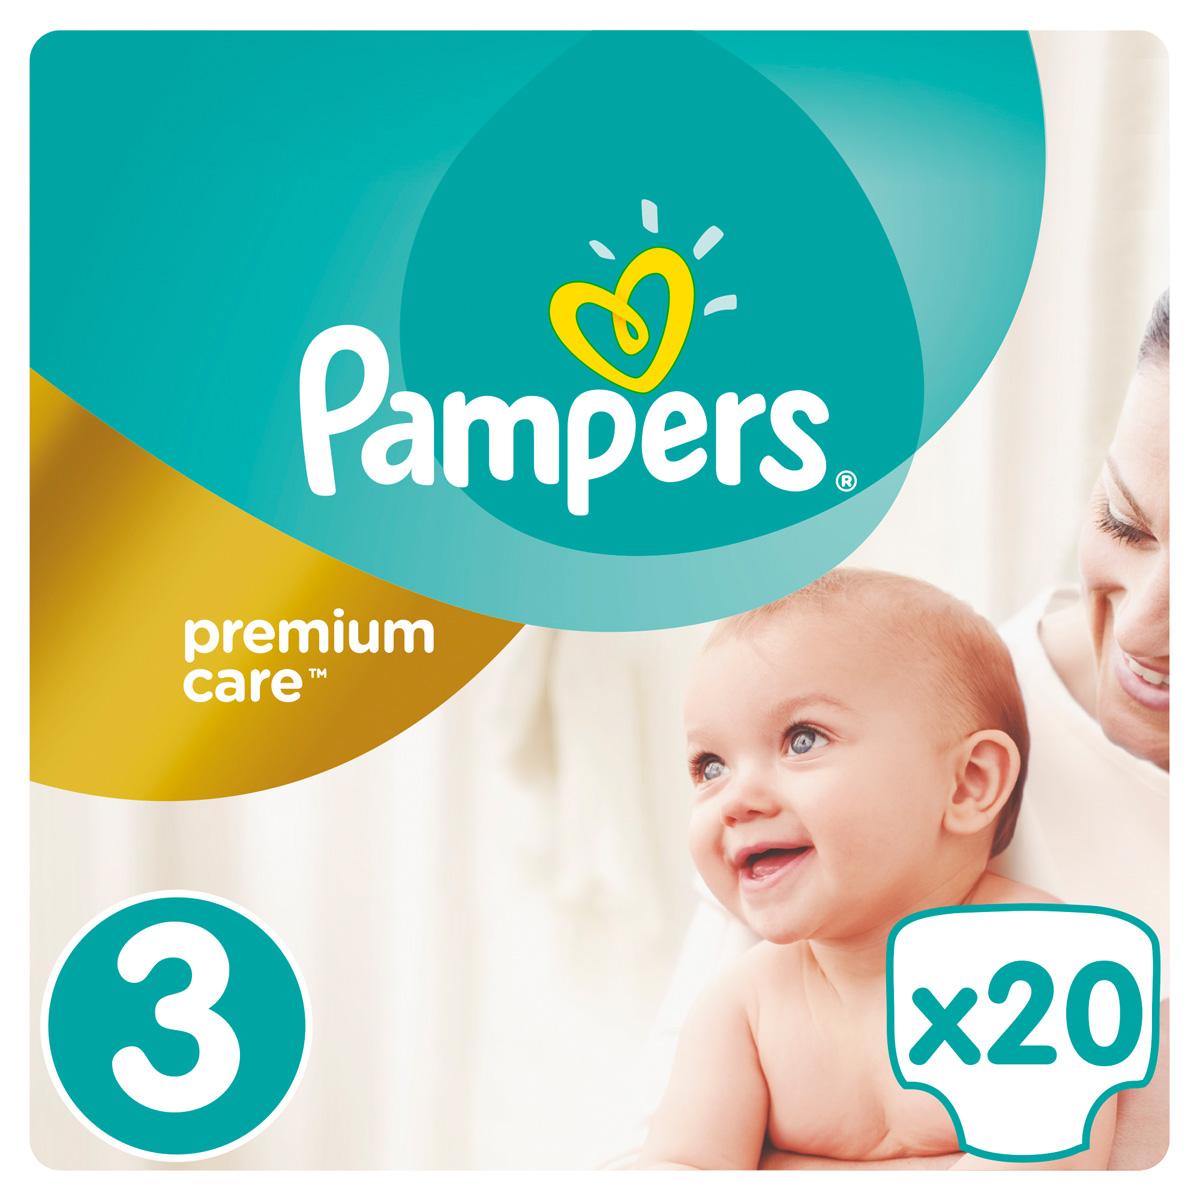 Pampers Подгузники Premium Care 5-9 кг (размер 3) 20 шт pampers подгузники pampers premium care 5 9 кг 3 размер 20 шт